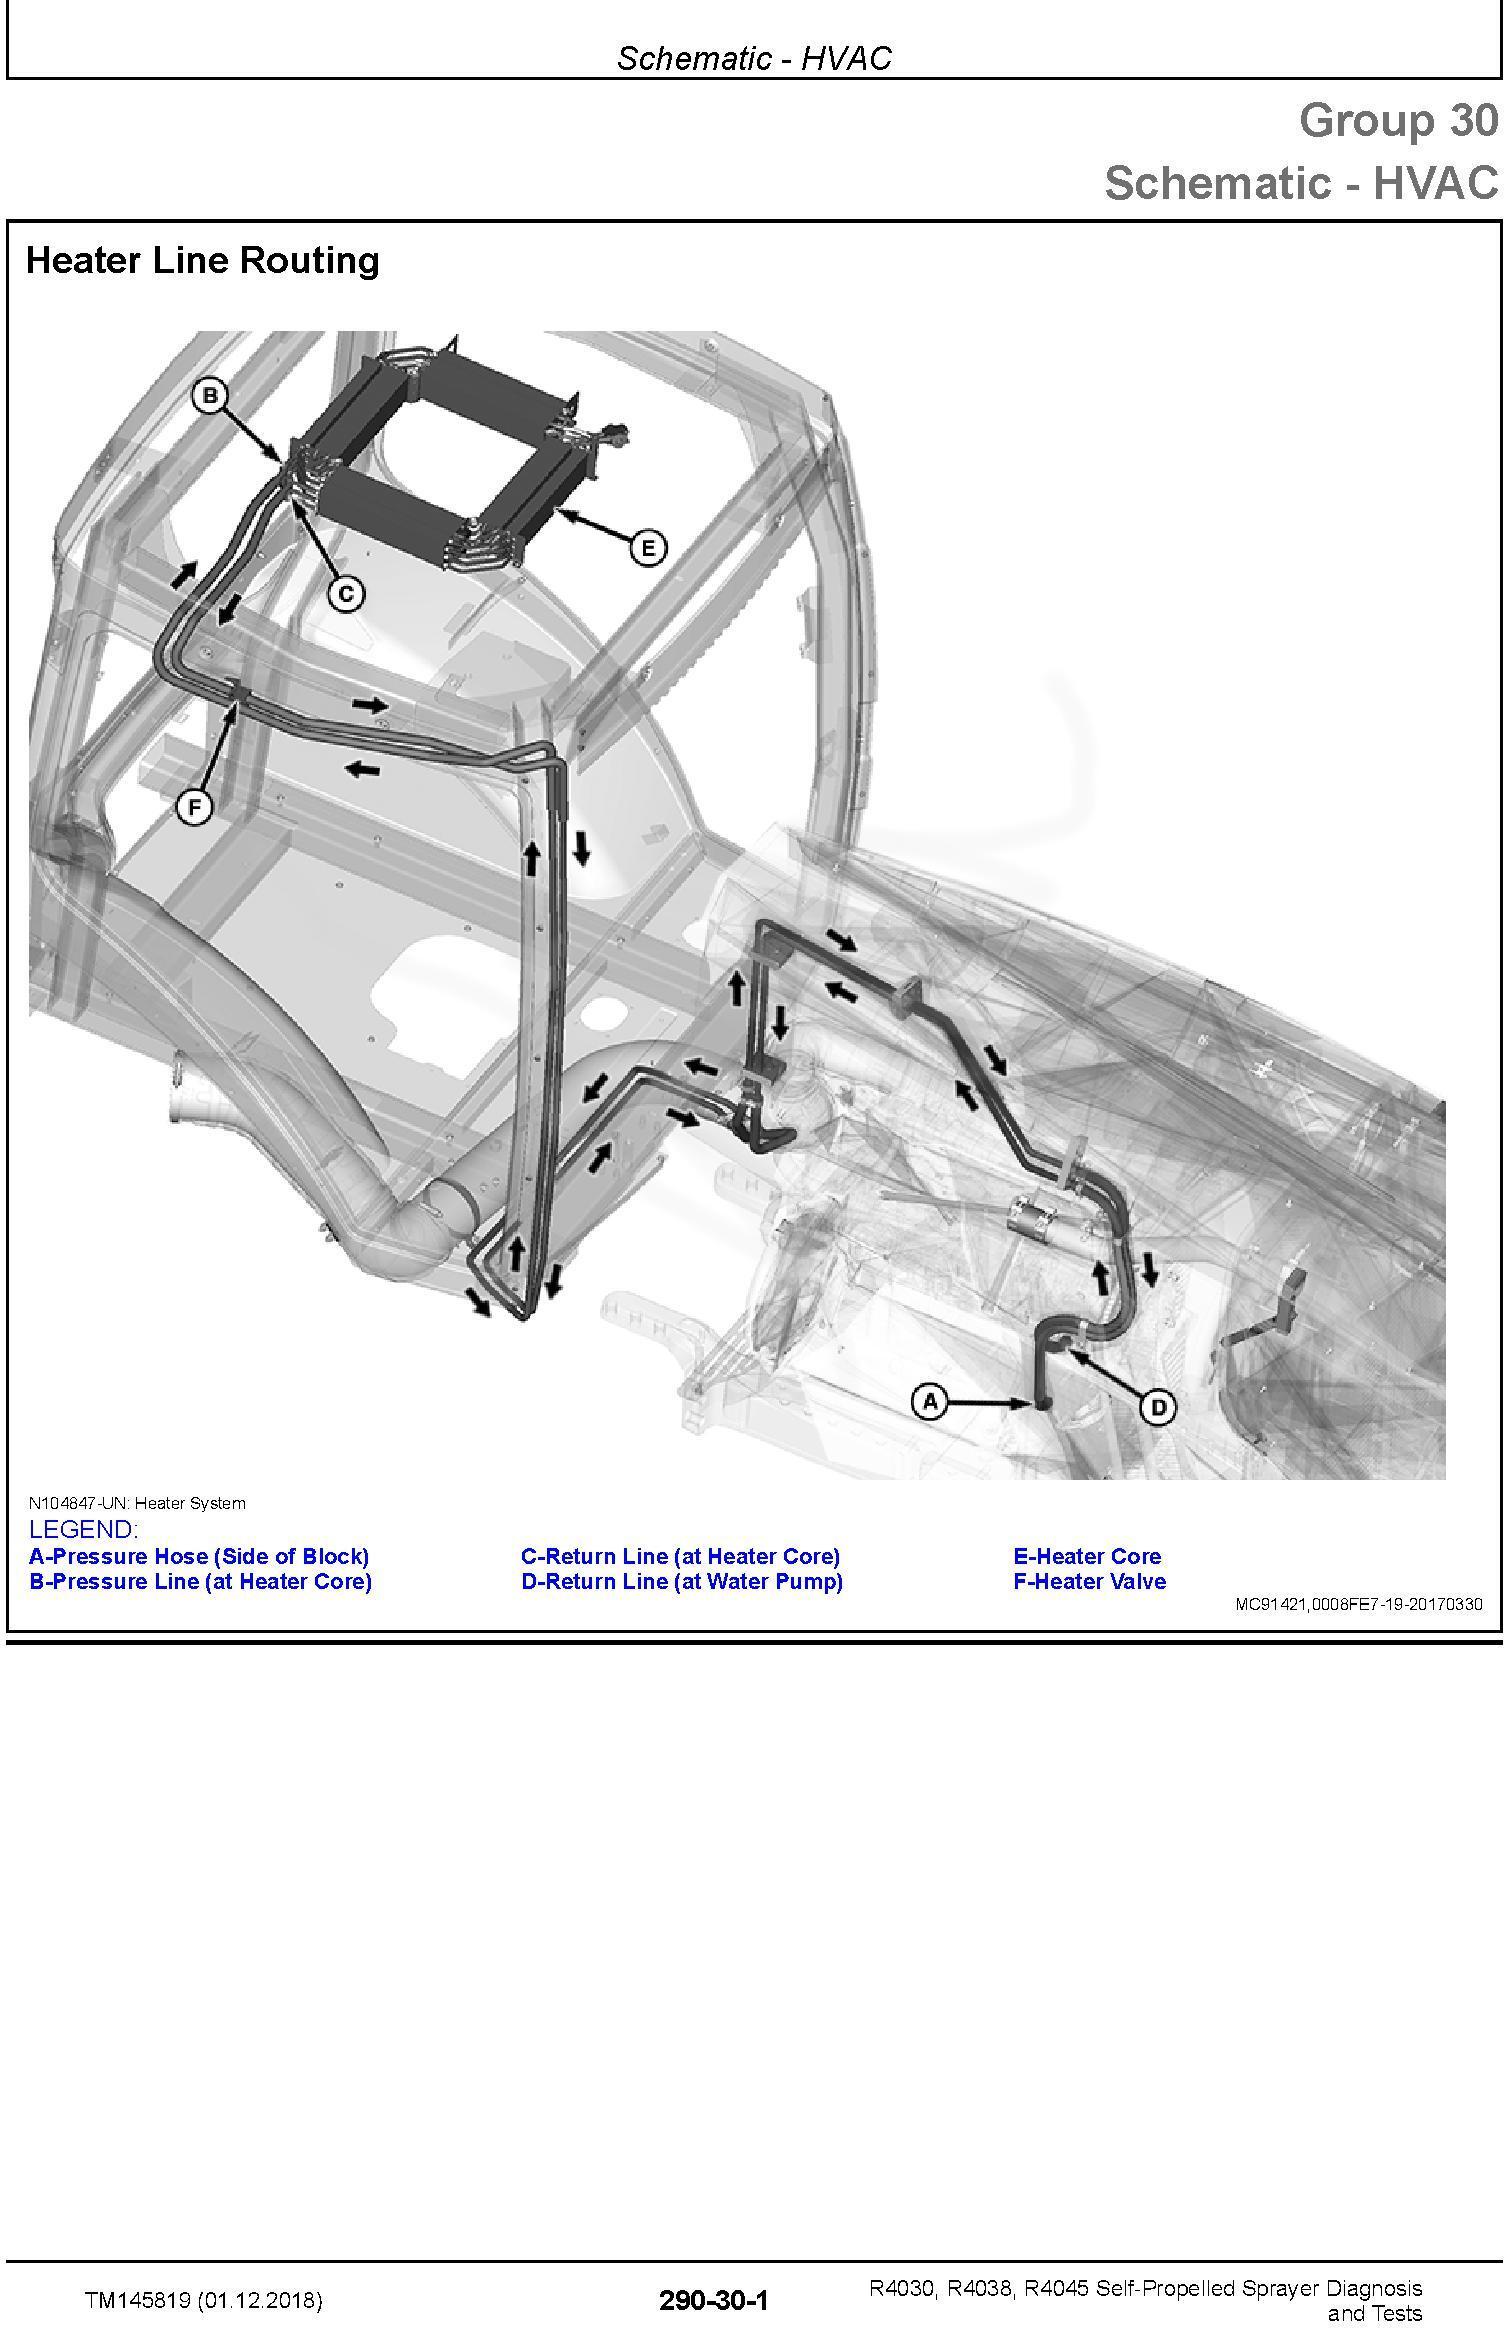 John Deere R4030, R4038, R4045 Self-Propelled Sprayer (SN.180001-) Diagnostic Manual (TM145819) - 3